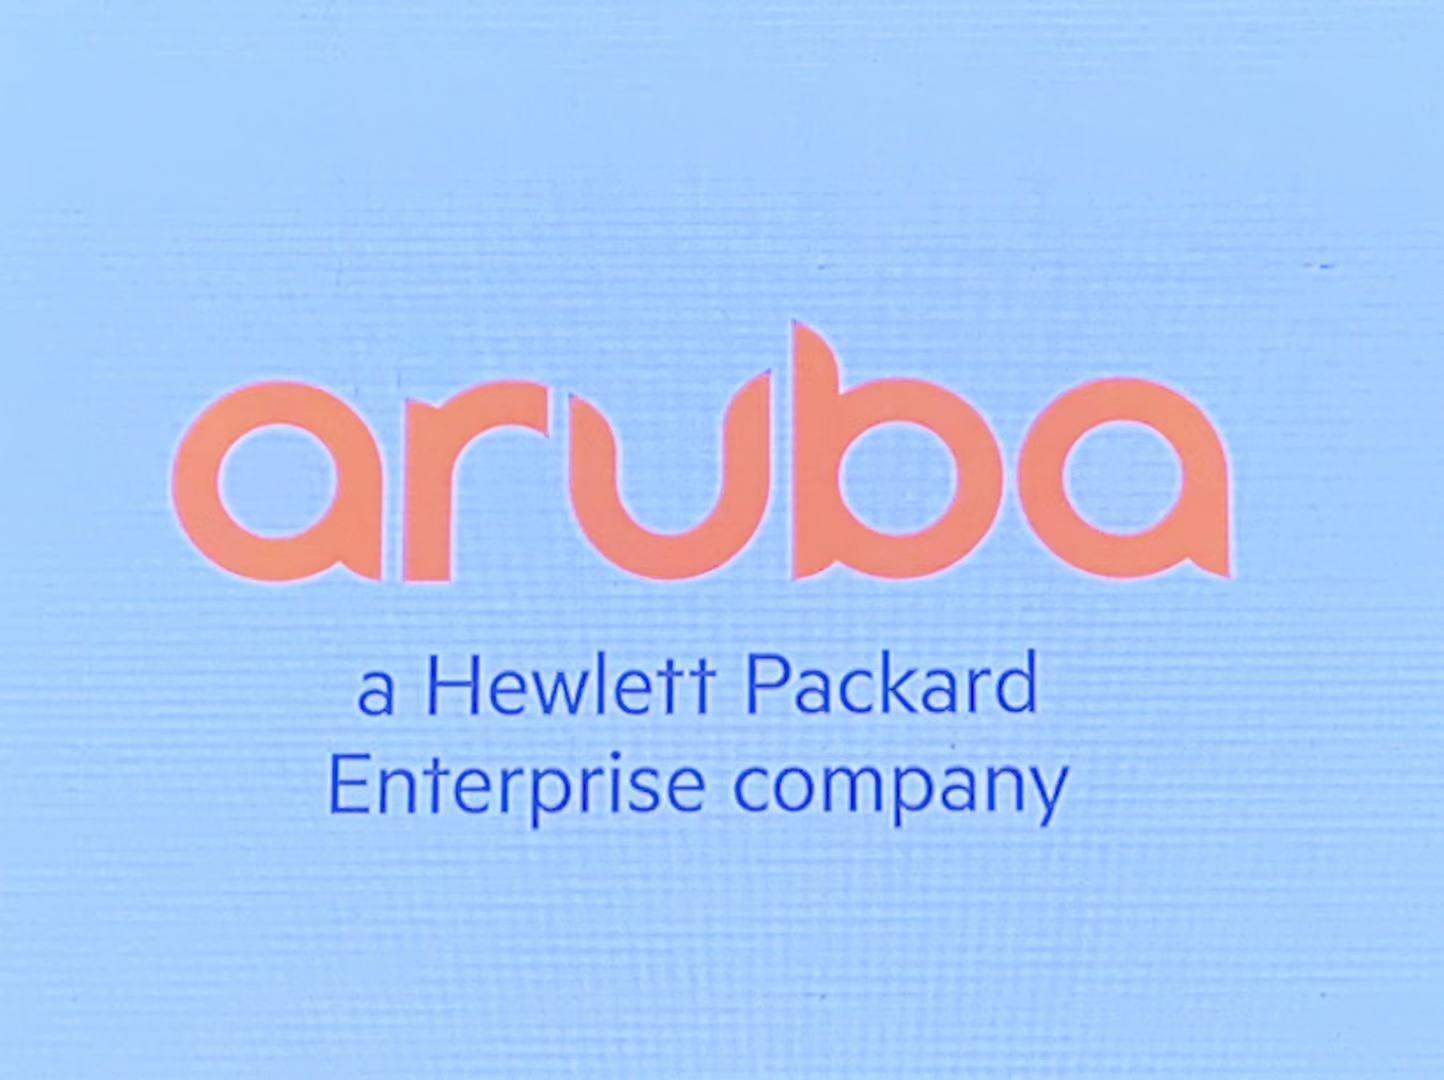 Aruba 推出Instant On无线解决新方案 争夺中小型企业Wi-Fi市场